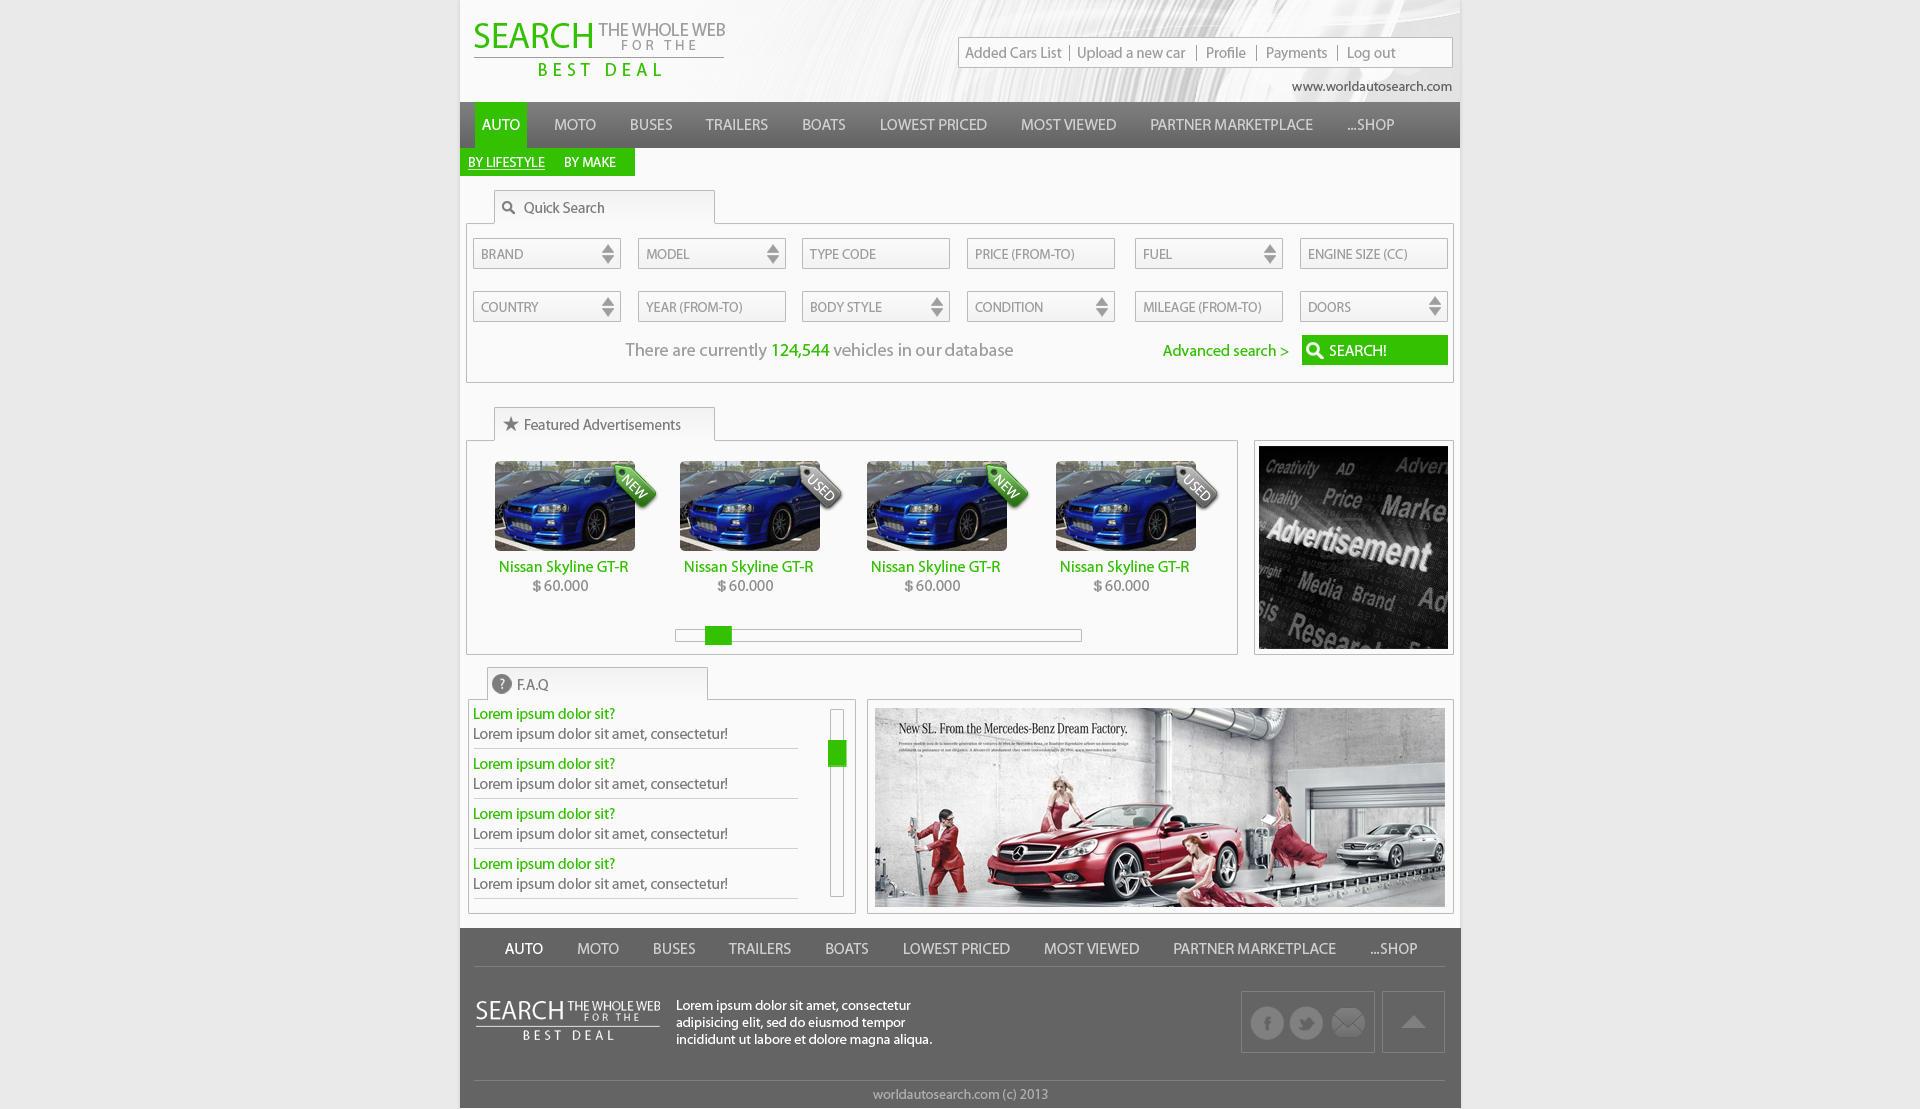 World Auto Search website design by SkinnyDesigns